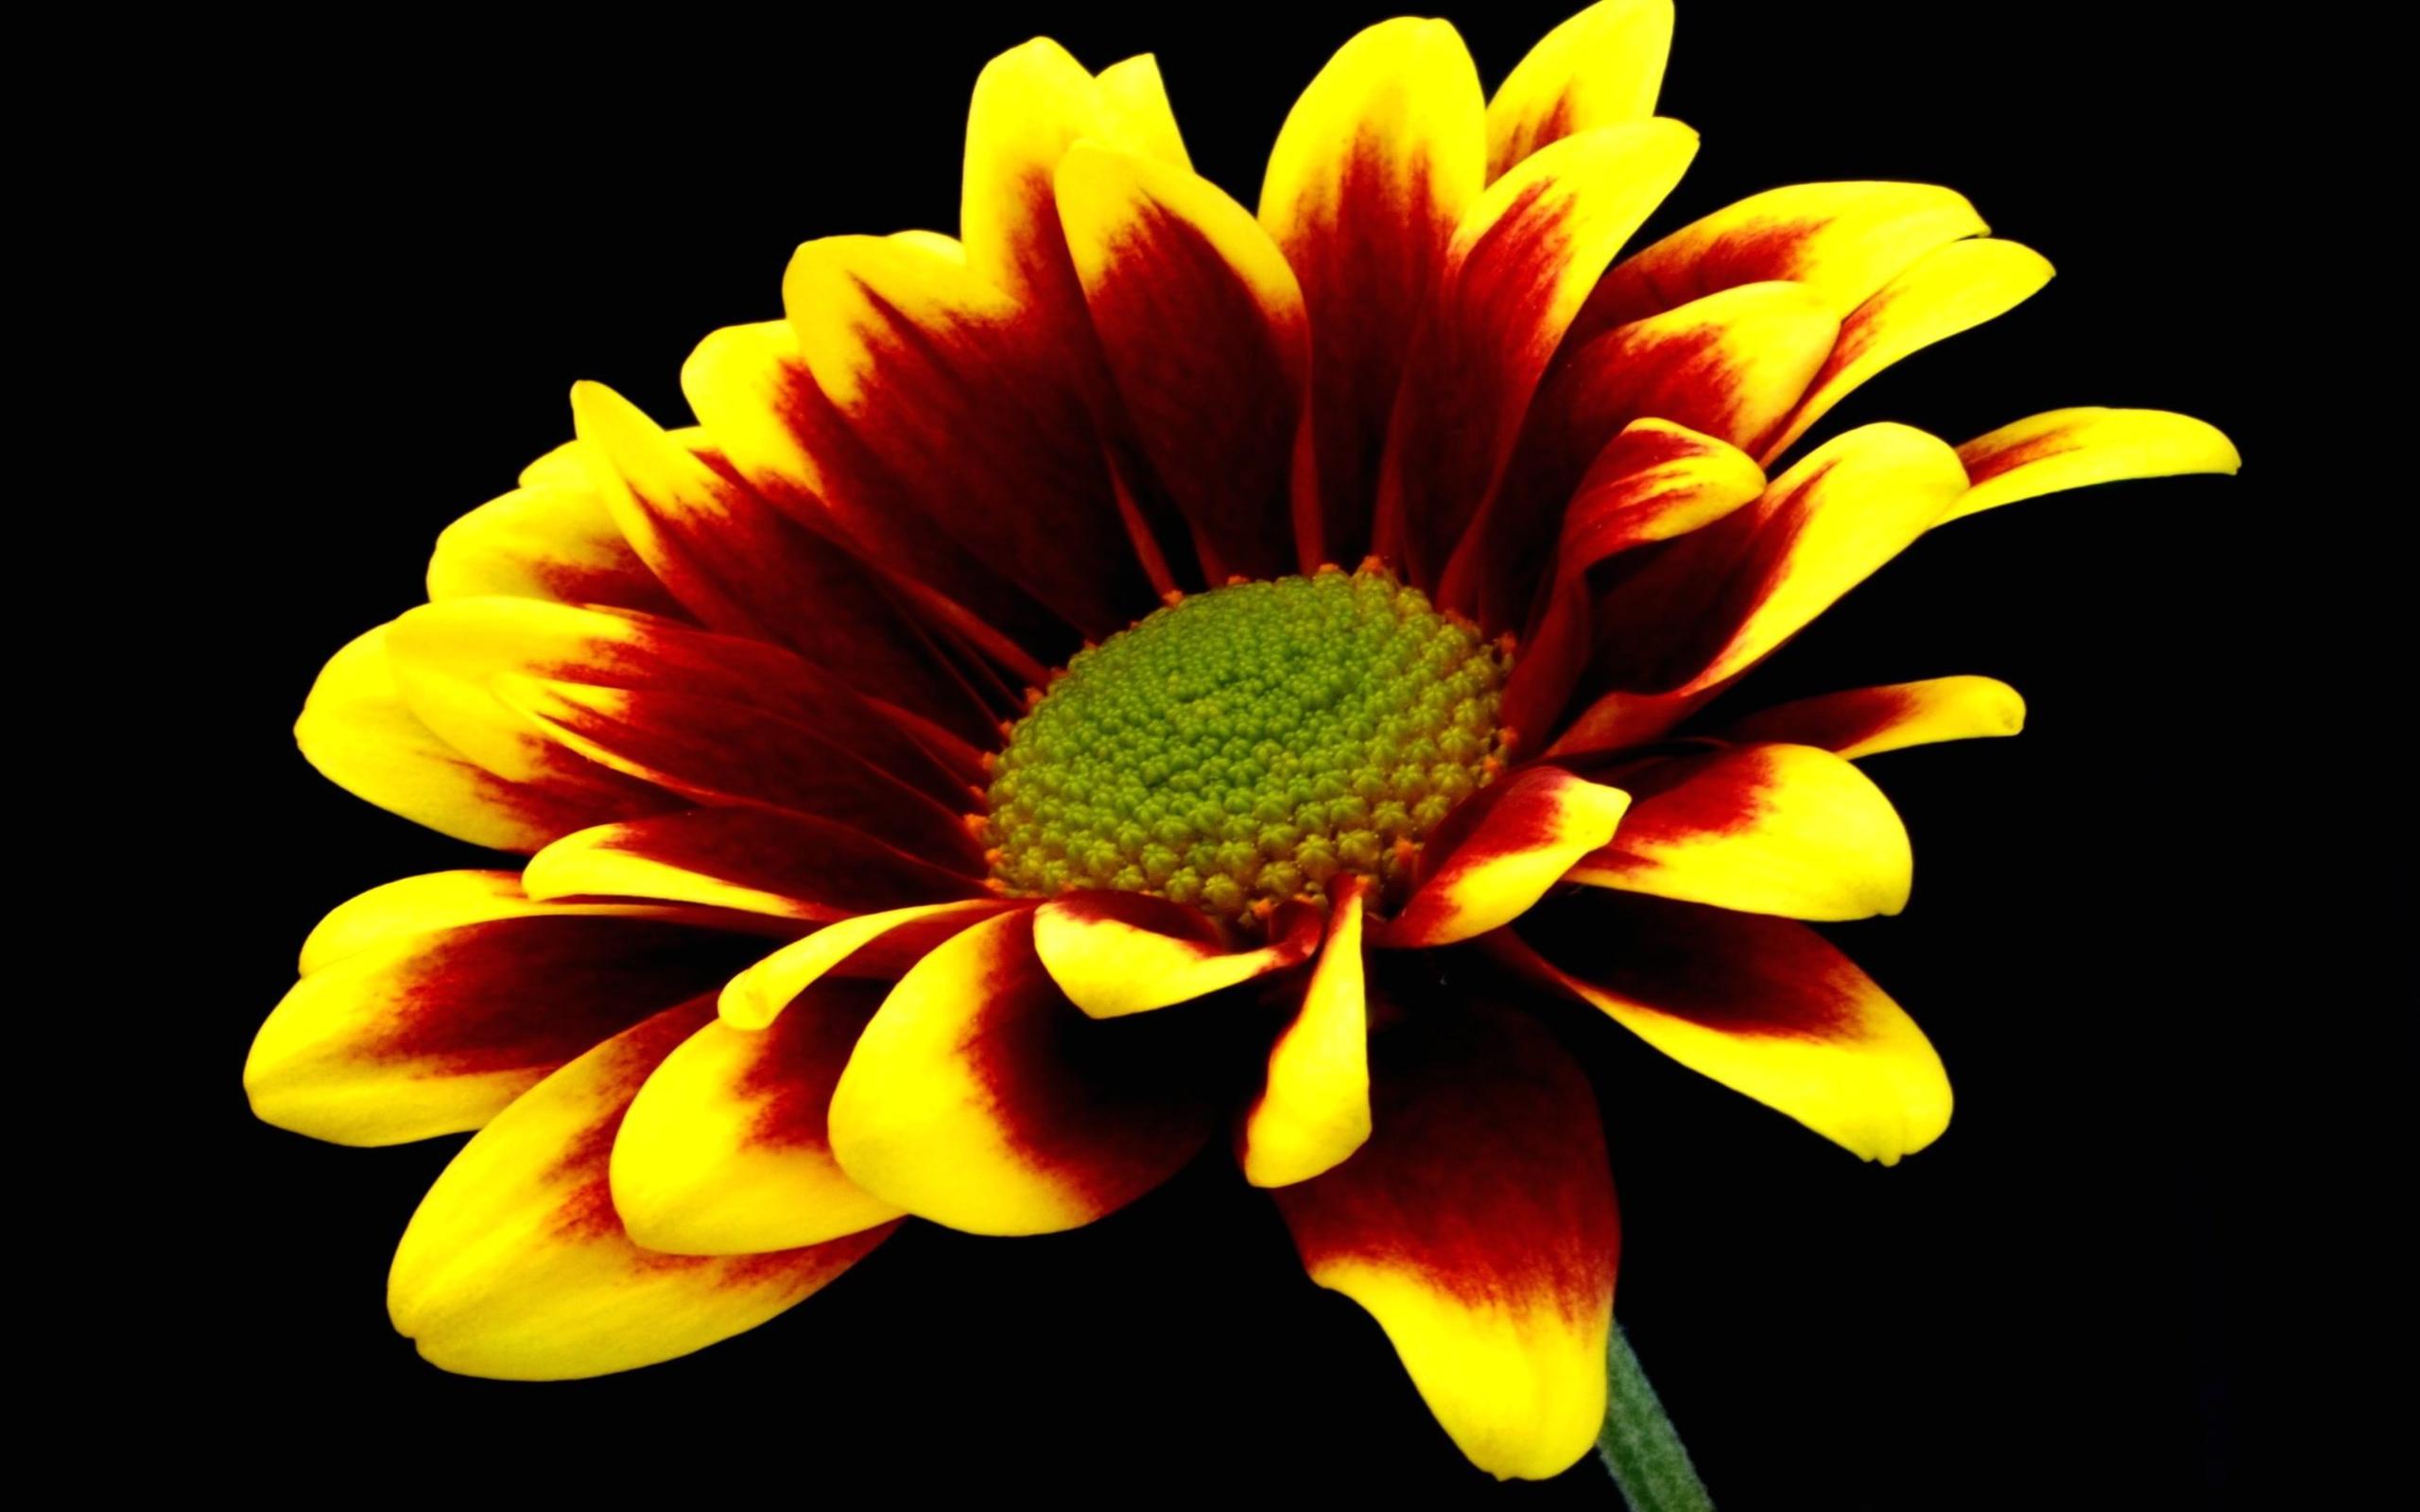 Flower Hd Wallpaper Background Image 2560x1600 Id114554